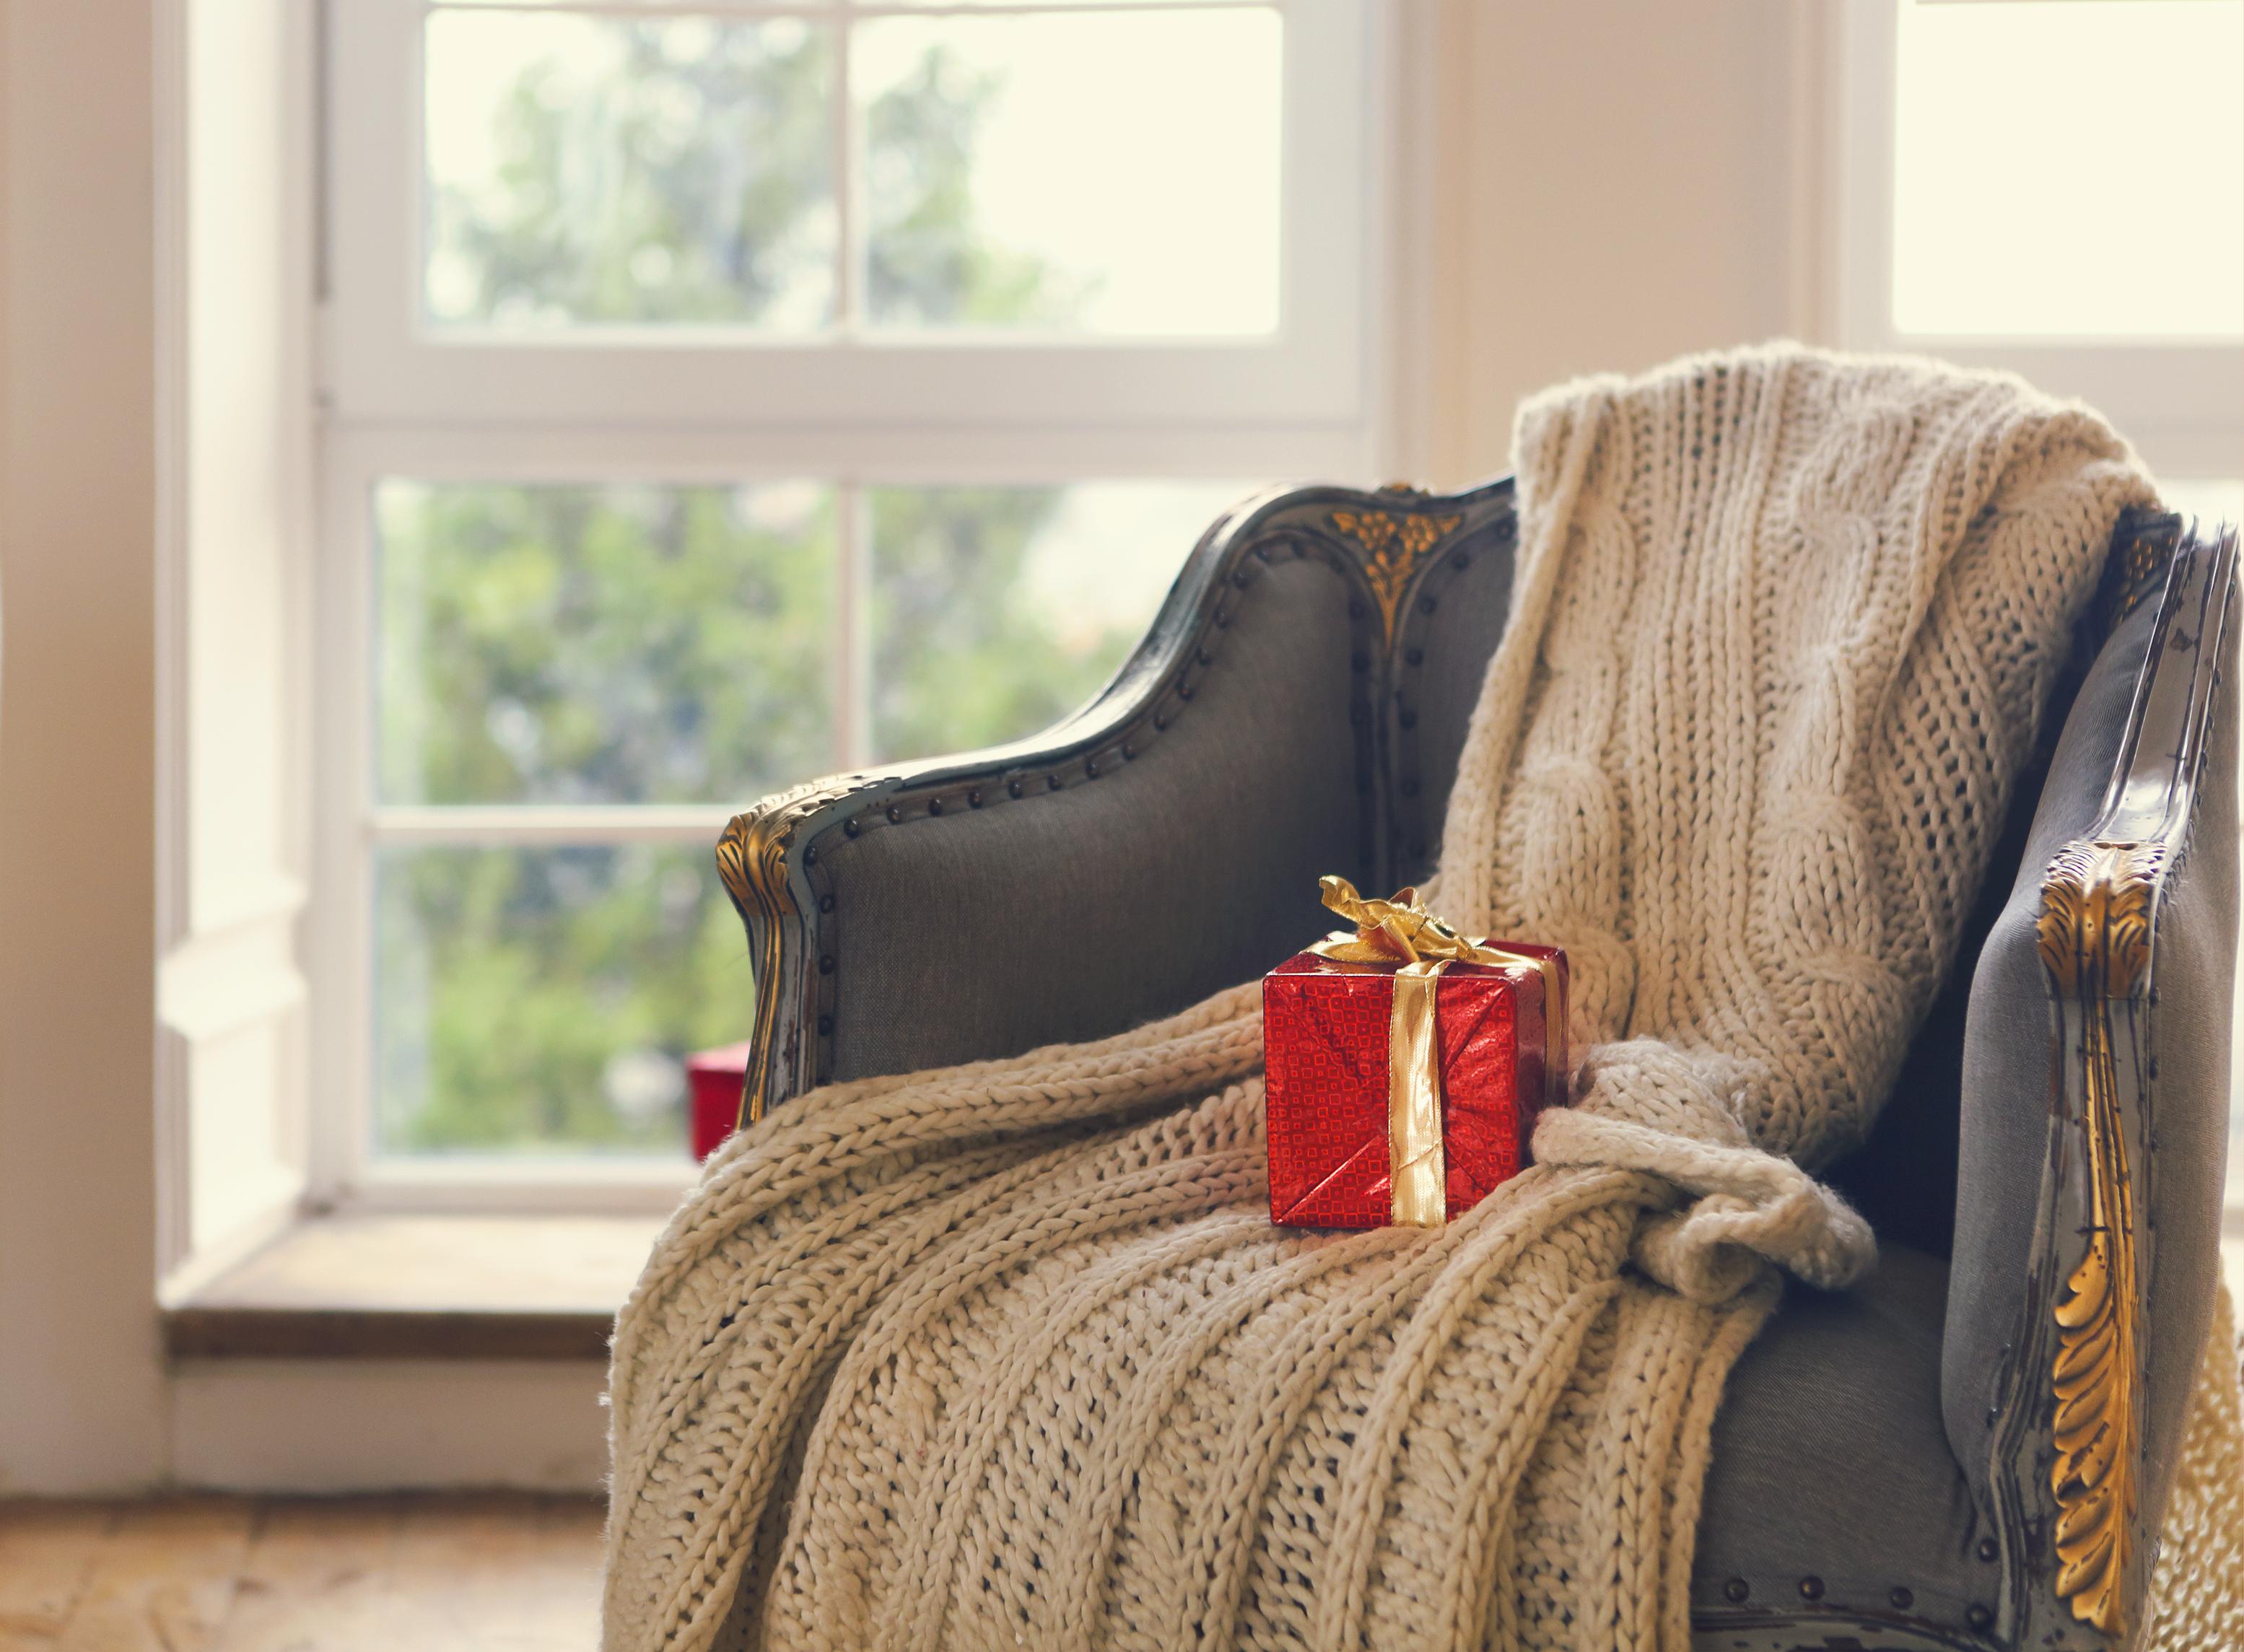 Blanket-in-Chair